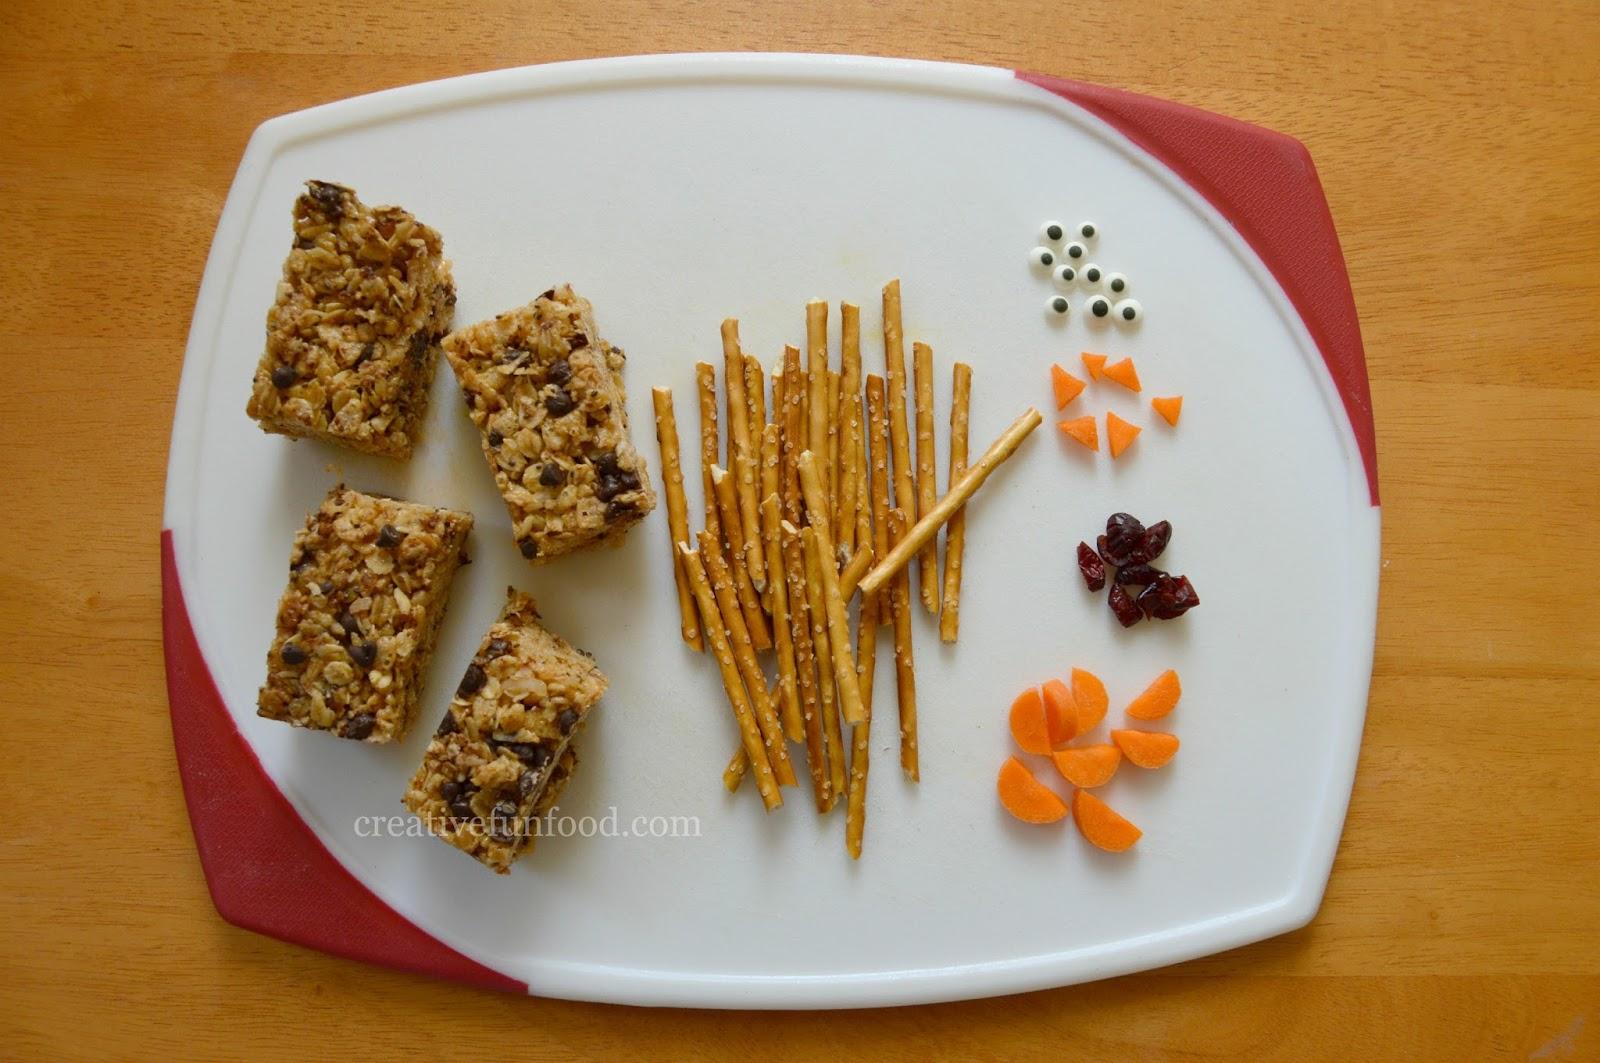 ... up granola snacks gobble up granola snacks no bake cookies i gobble up